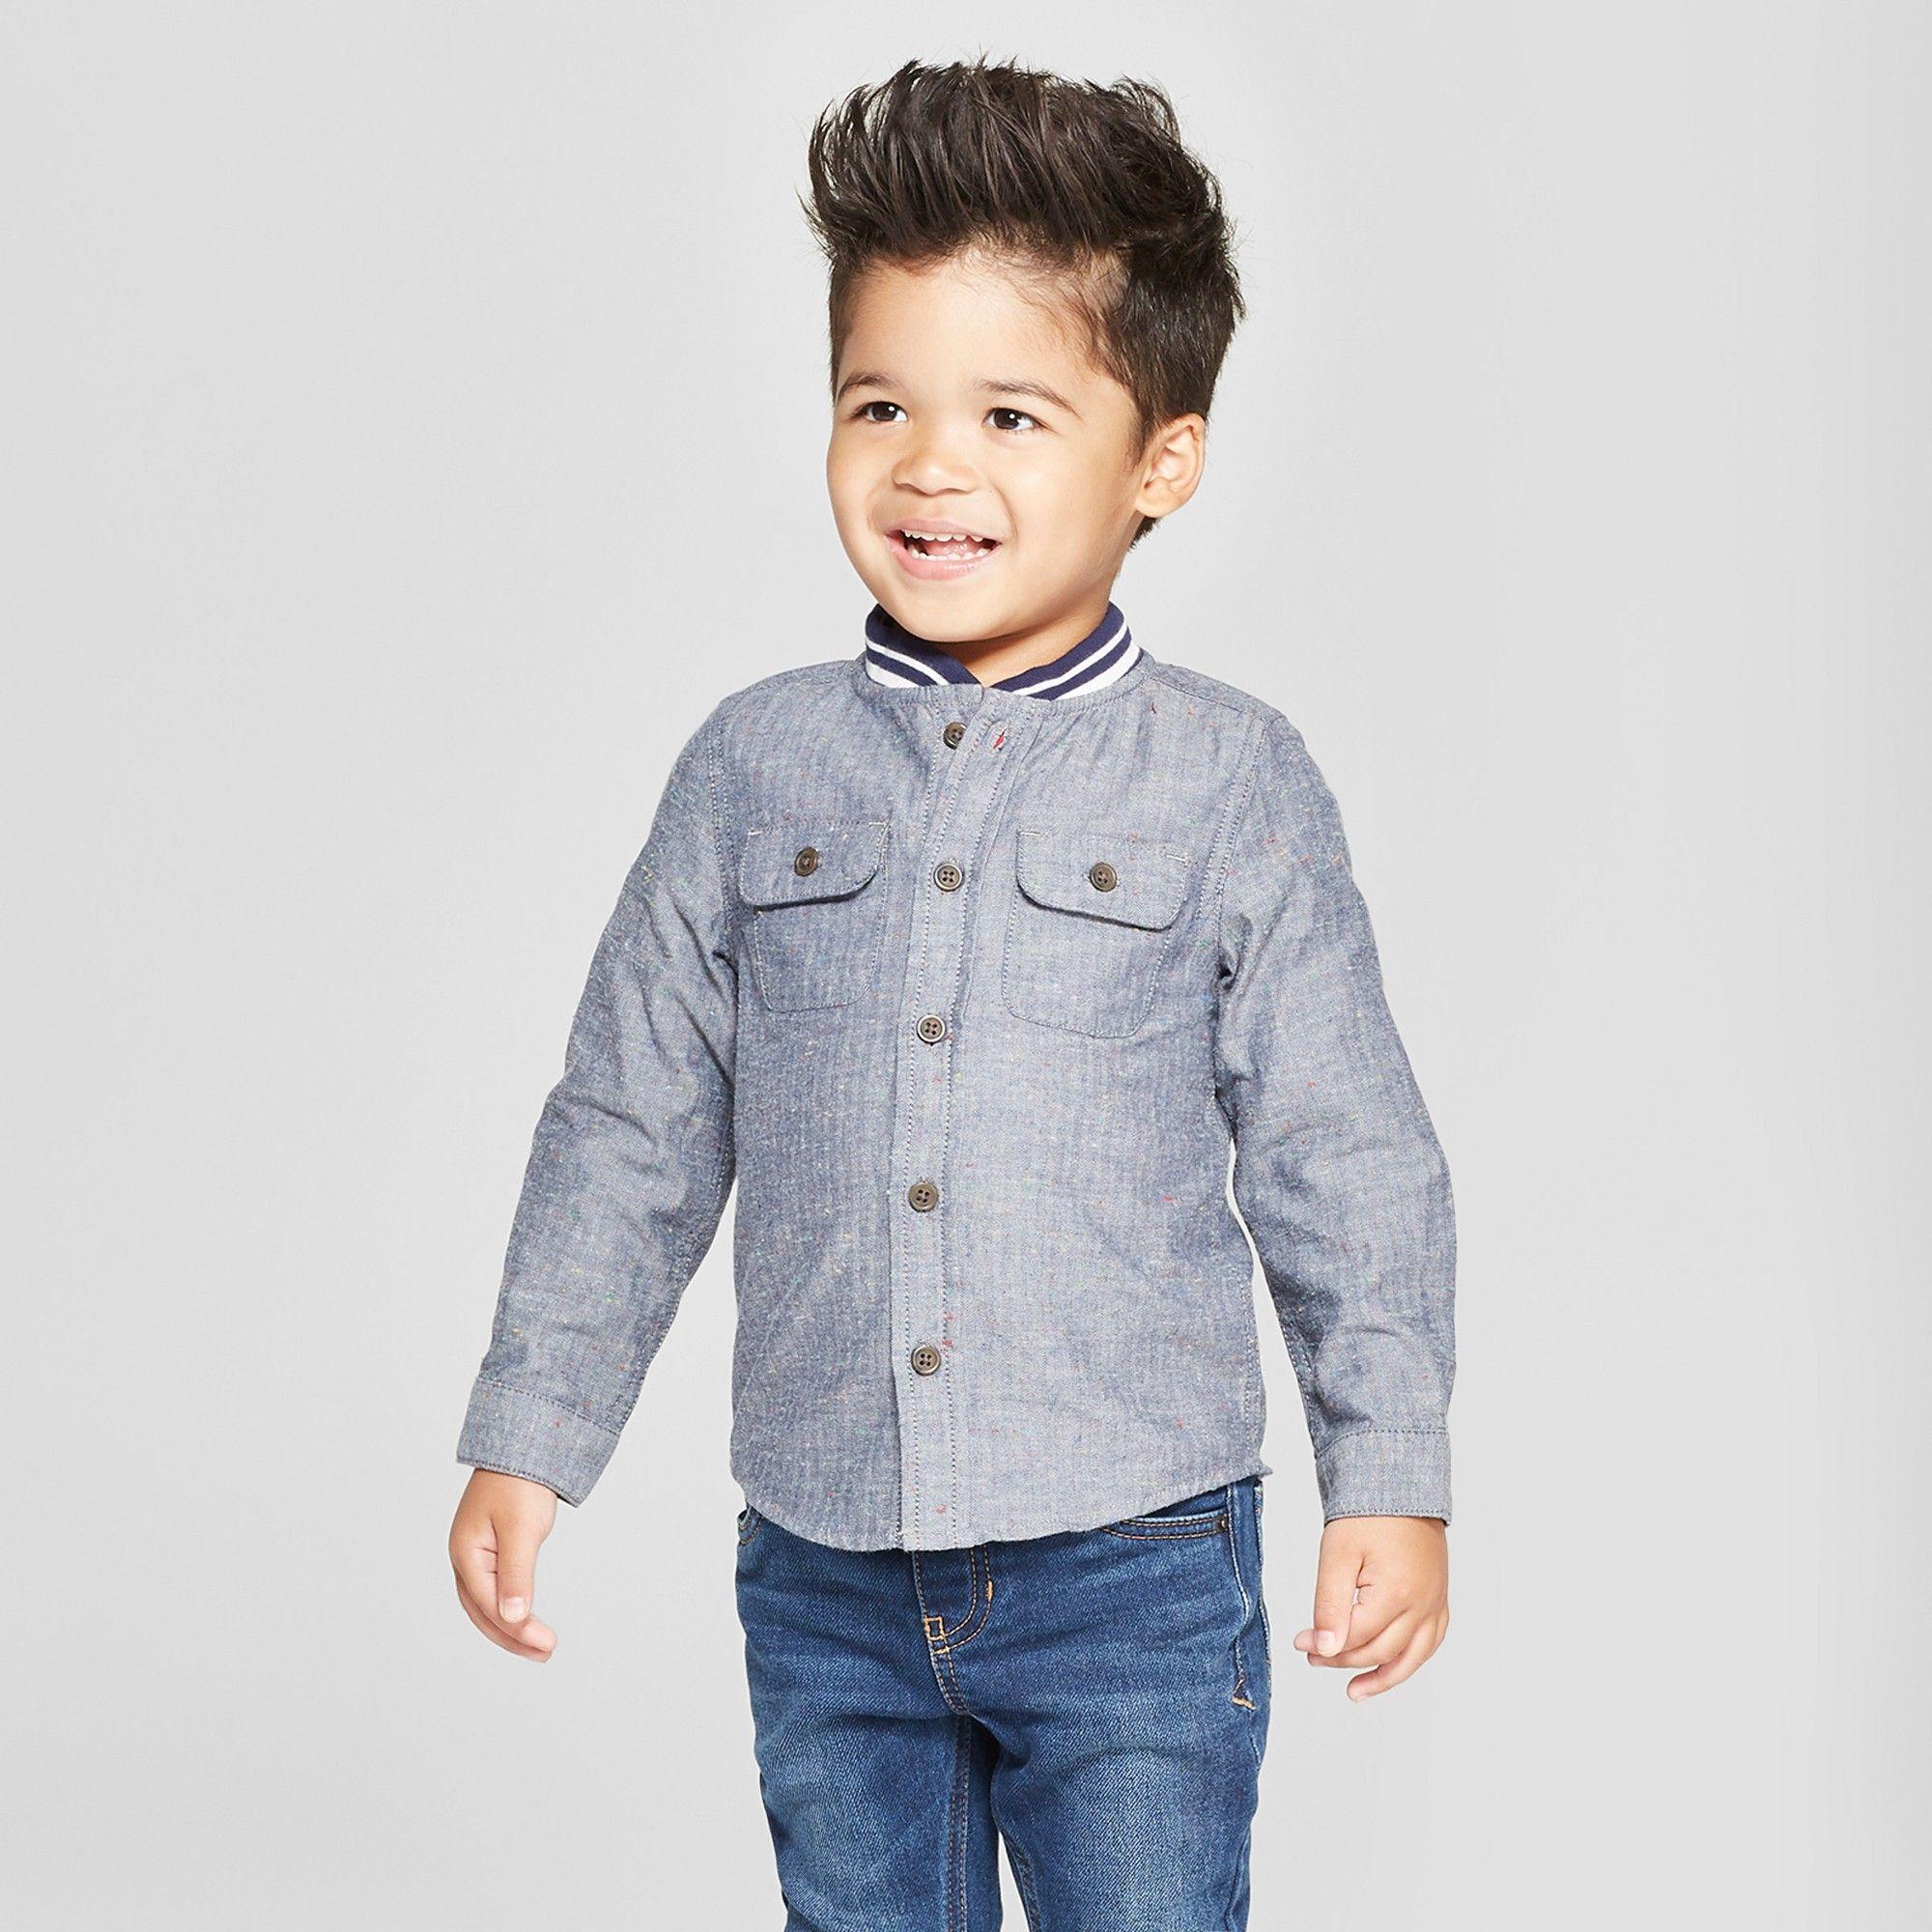 Toddler Boys' Long Sleeve Rib Knit Collar Button Down Shirt